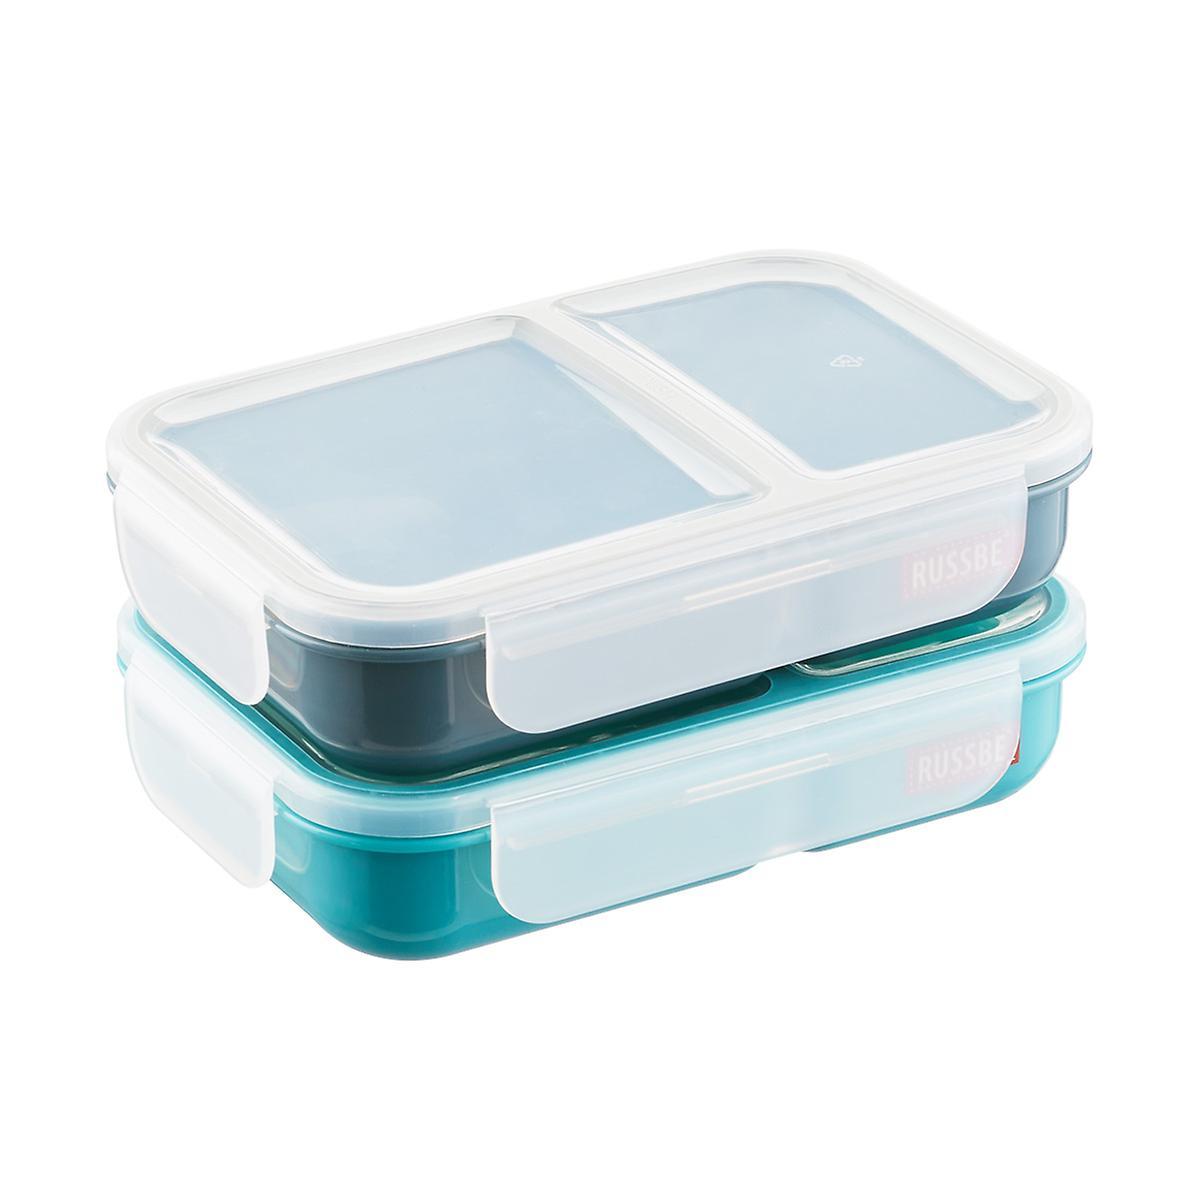 Russbe 23 oz. 2-Compartment Bento Box